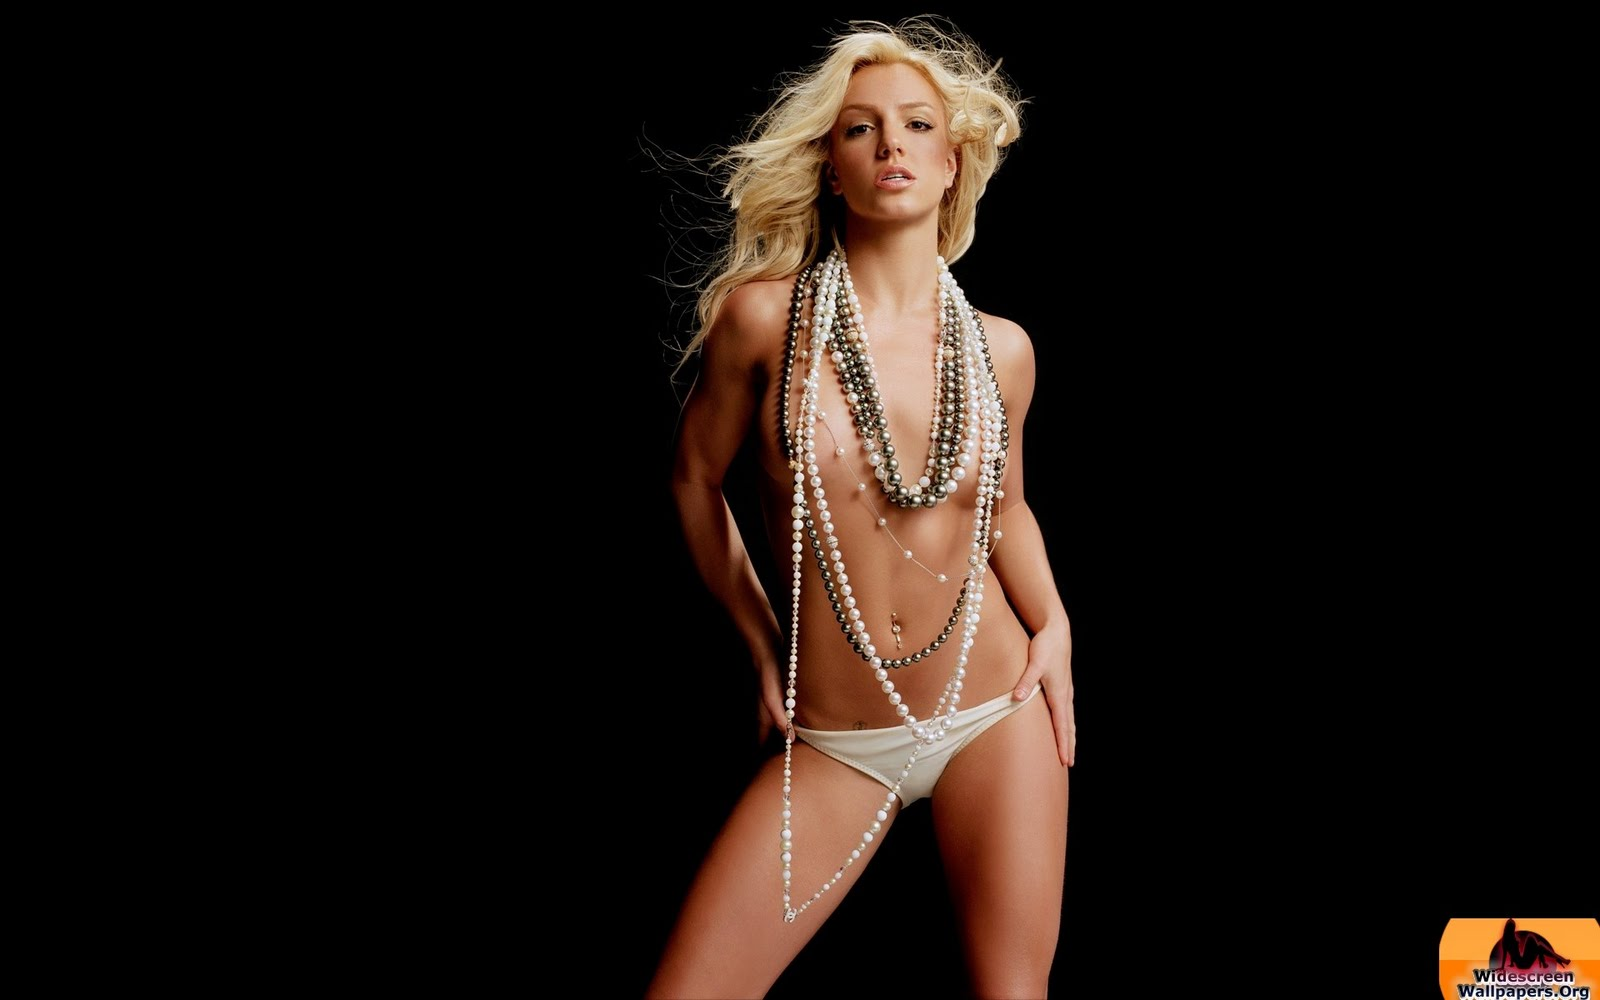 http://1.bp.blogspot.com/-_ab0YeGMSwg/TmR5kgJRXuI/AAAAAAAACs4/MJ14OxCyHm0/s1600/Britney+Spears+2011+Photos+20.jpg